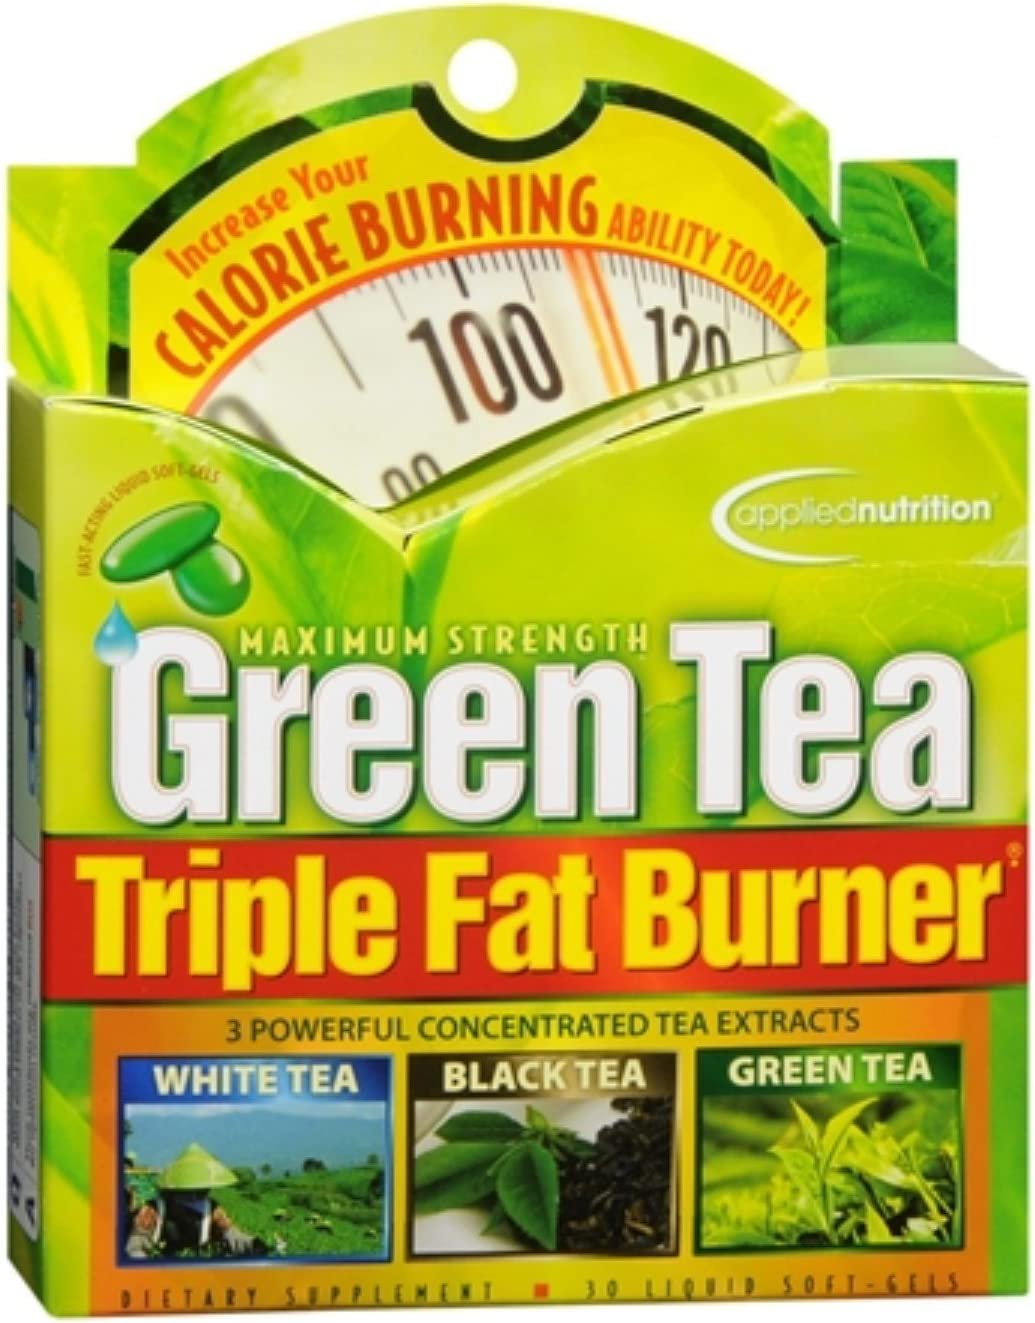 Applied Nutrition Green Tea Triple Fat Burner Liquid Soft-Gels 30 Soft Gels (Pack of 4)